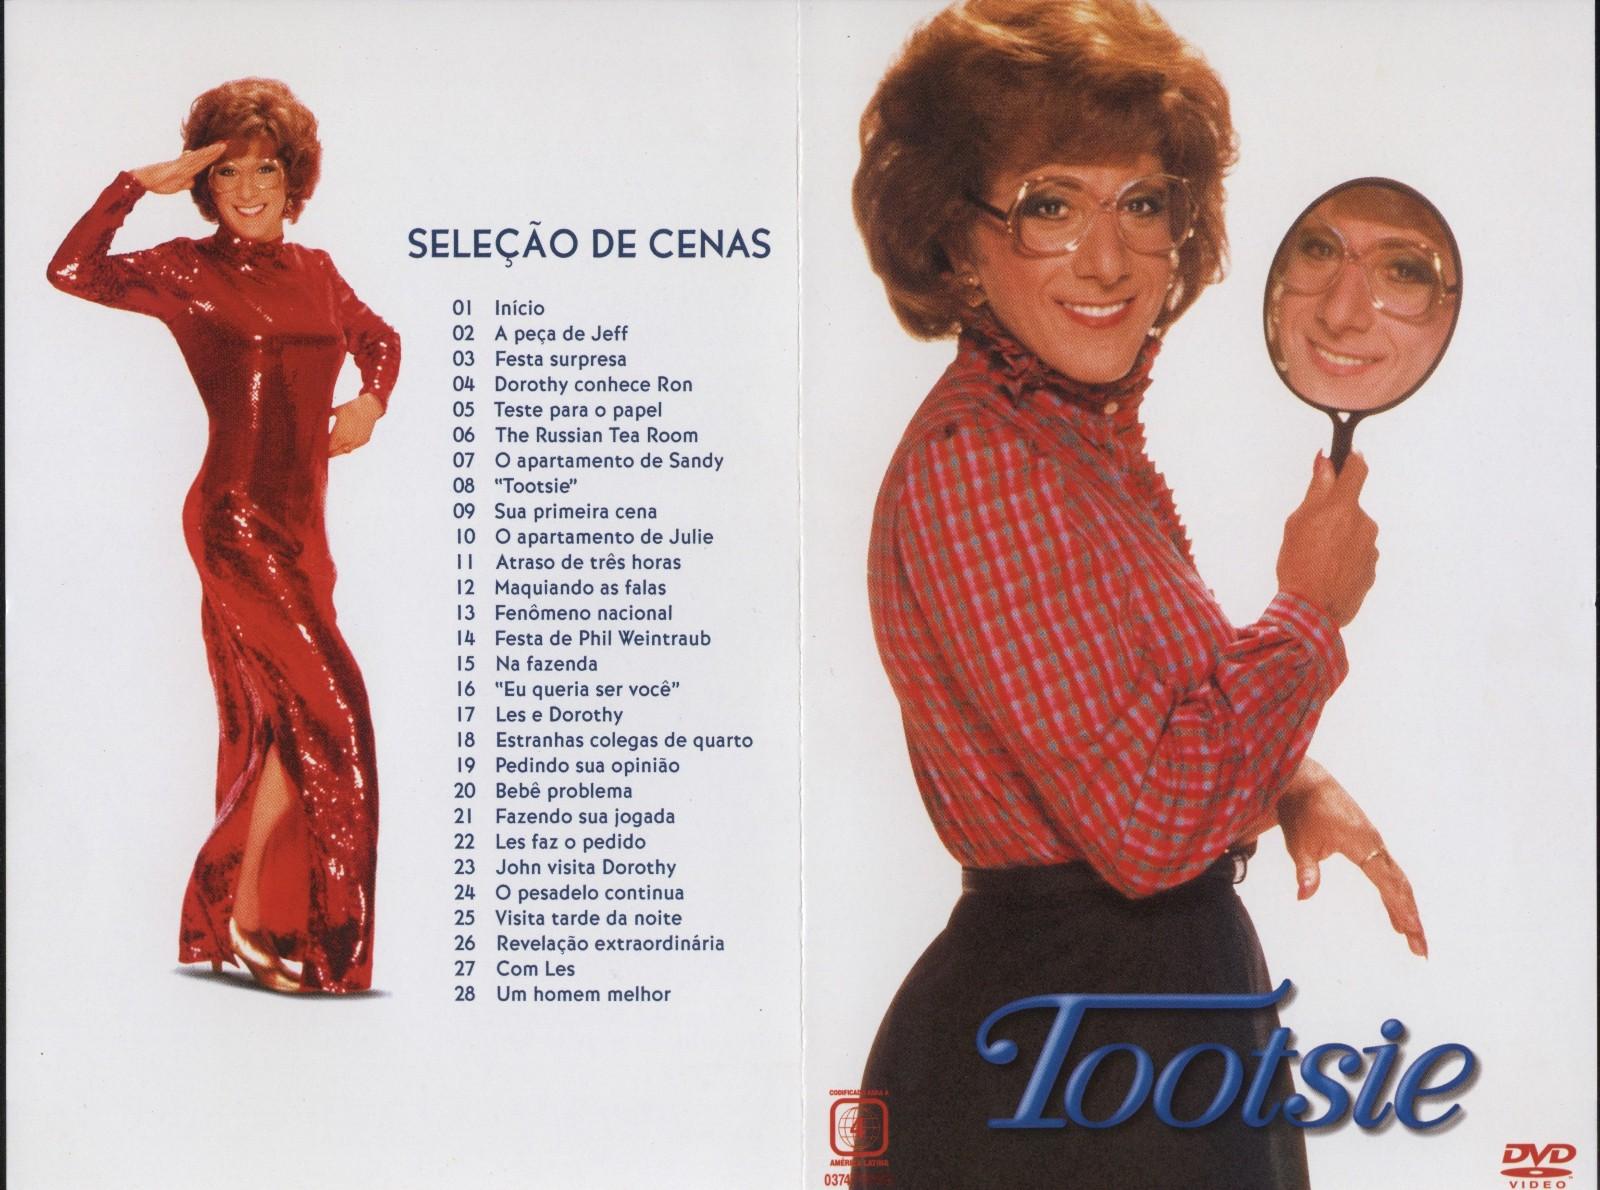 Inside DVD Tootsie